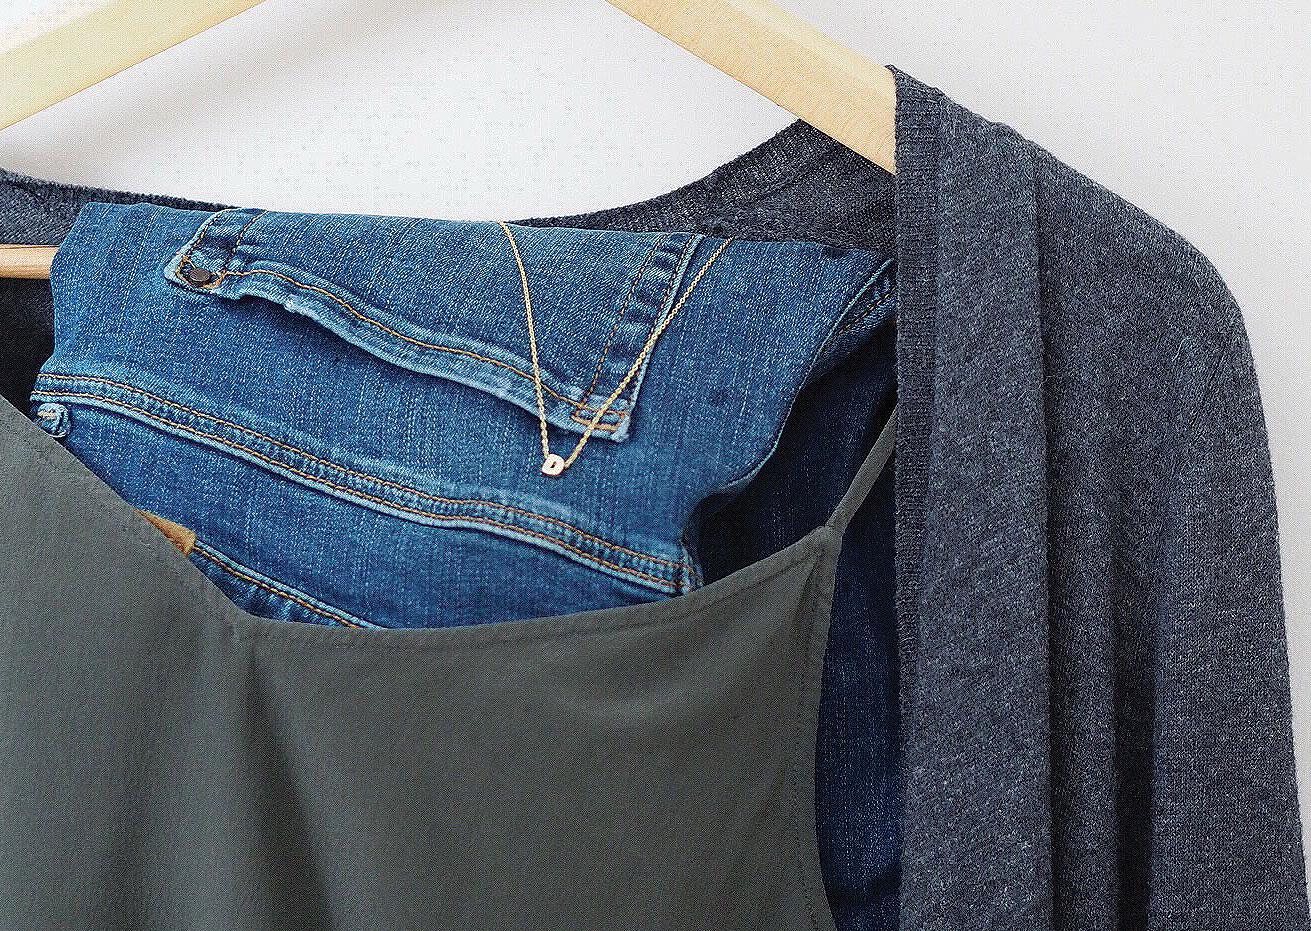 capsule-wardrobe-workshop-derbyshire-5